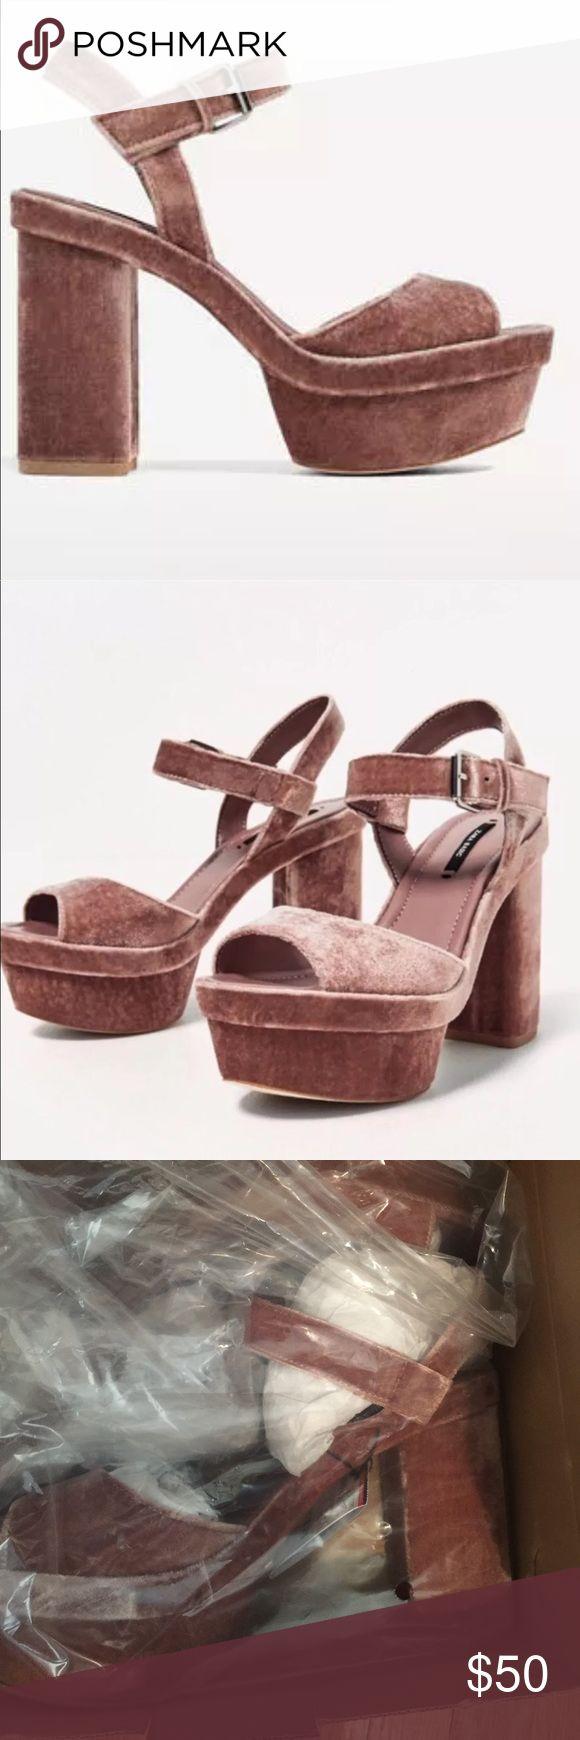 Zara Velvet Platform Sandals Size 8 UK 39 Velvet Zara Shoes Platforms